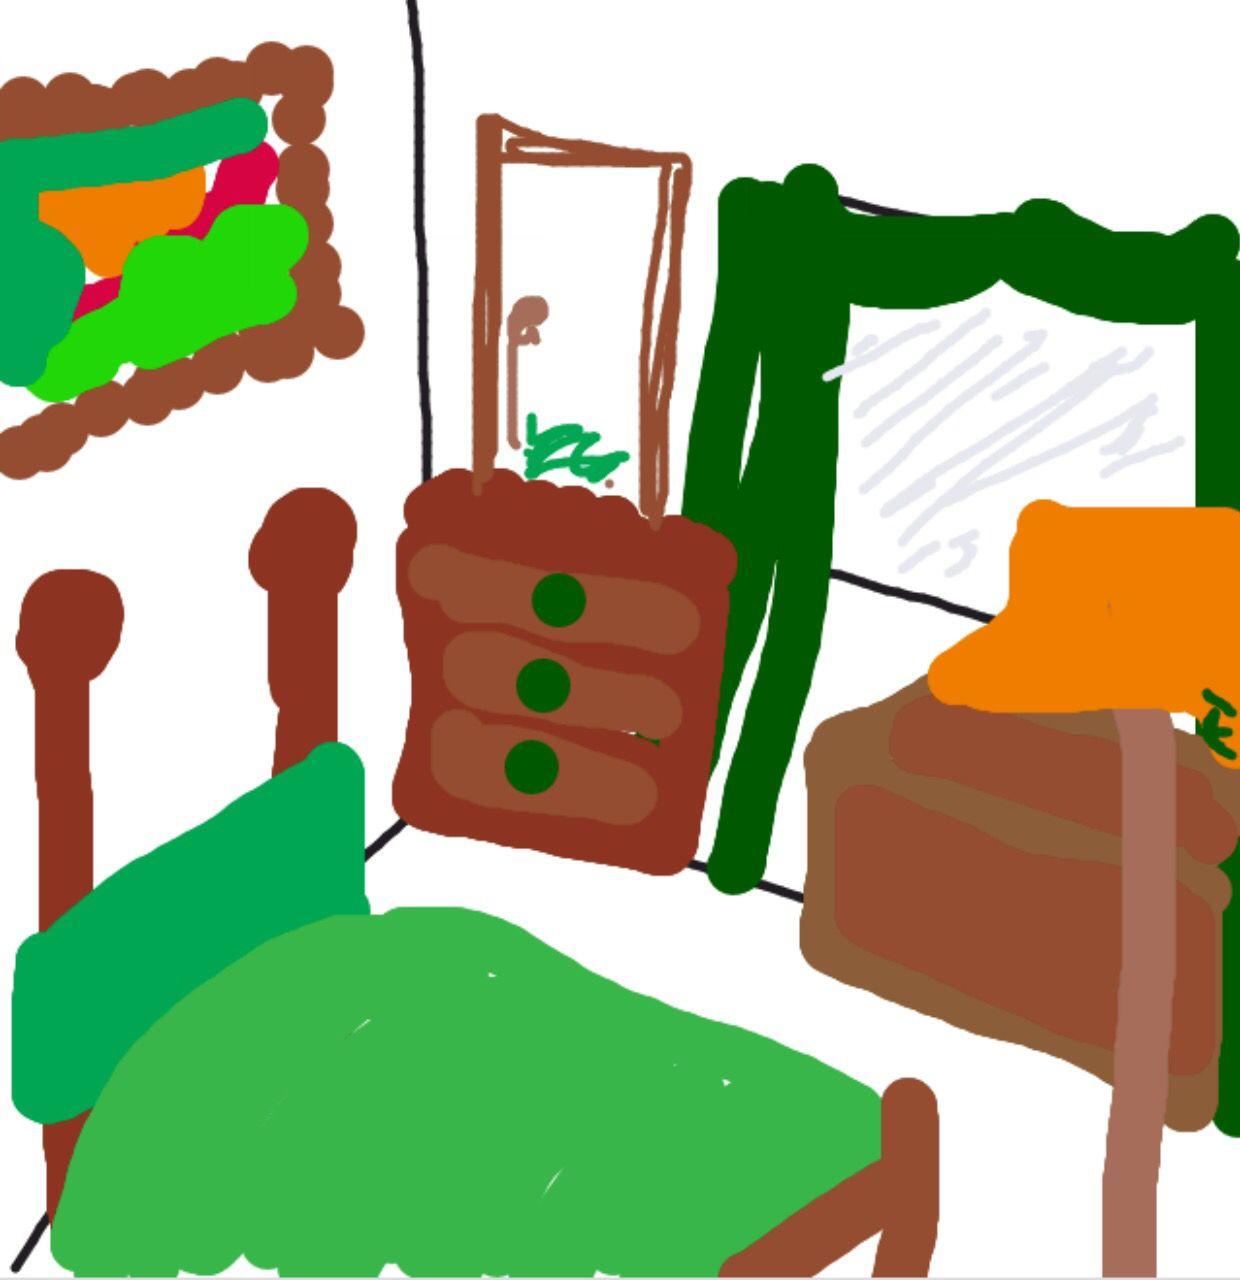 Bedroom in DrawSomething Mario characters, Character